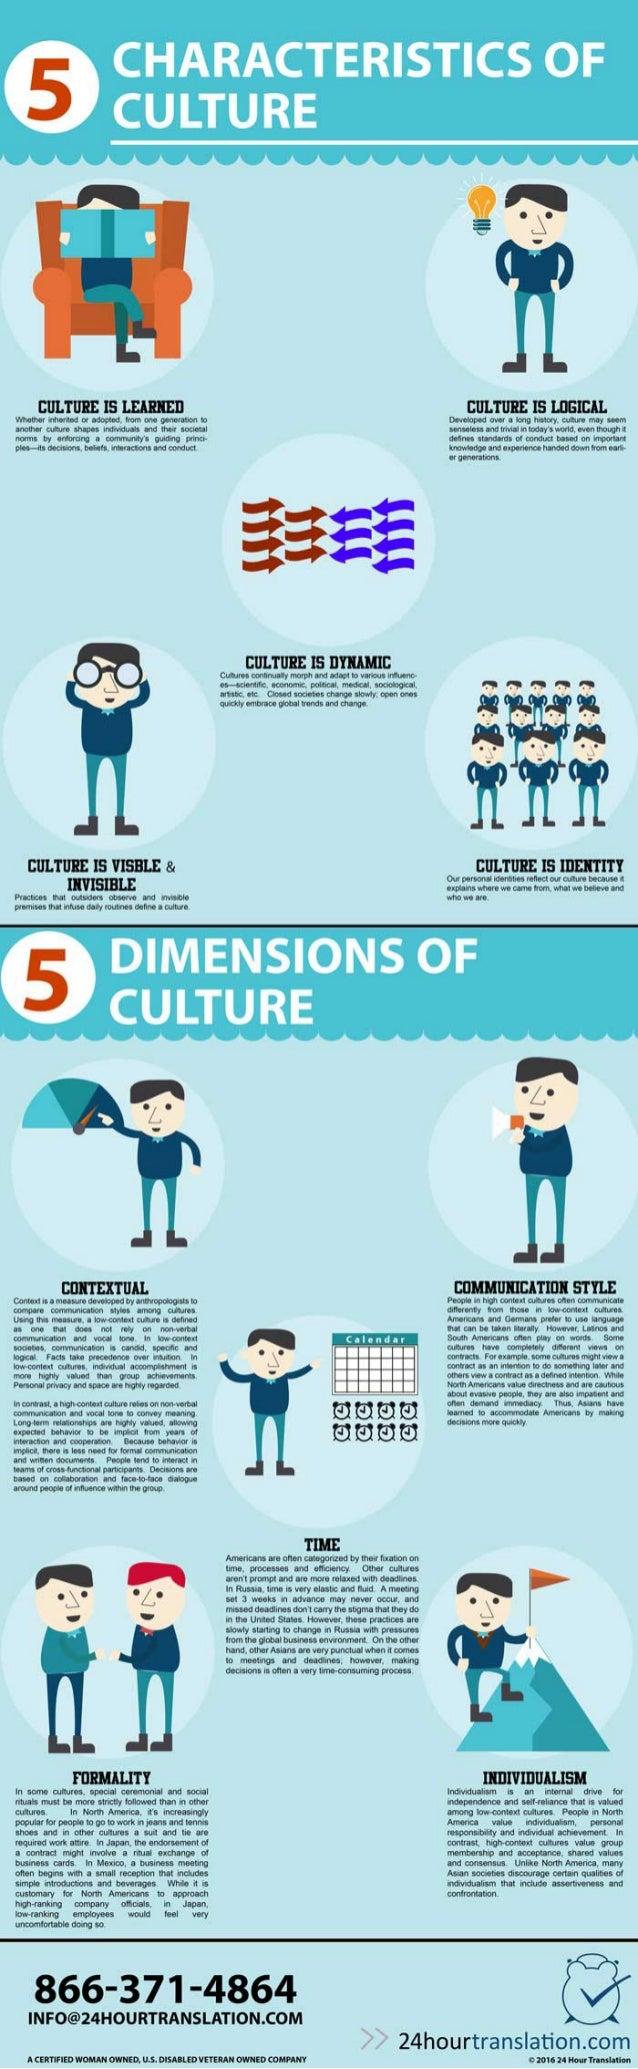 Characteristics and Dimensions of Culture